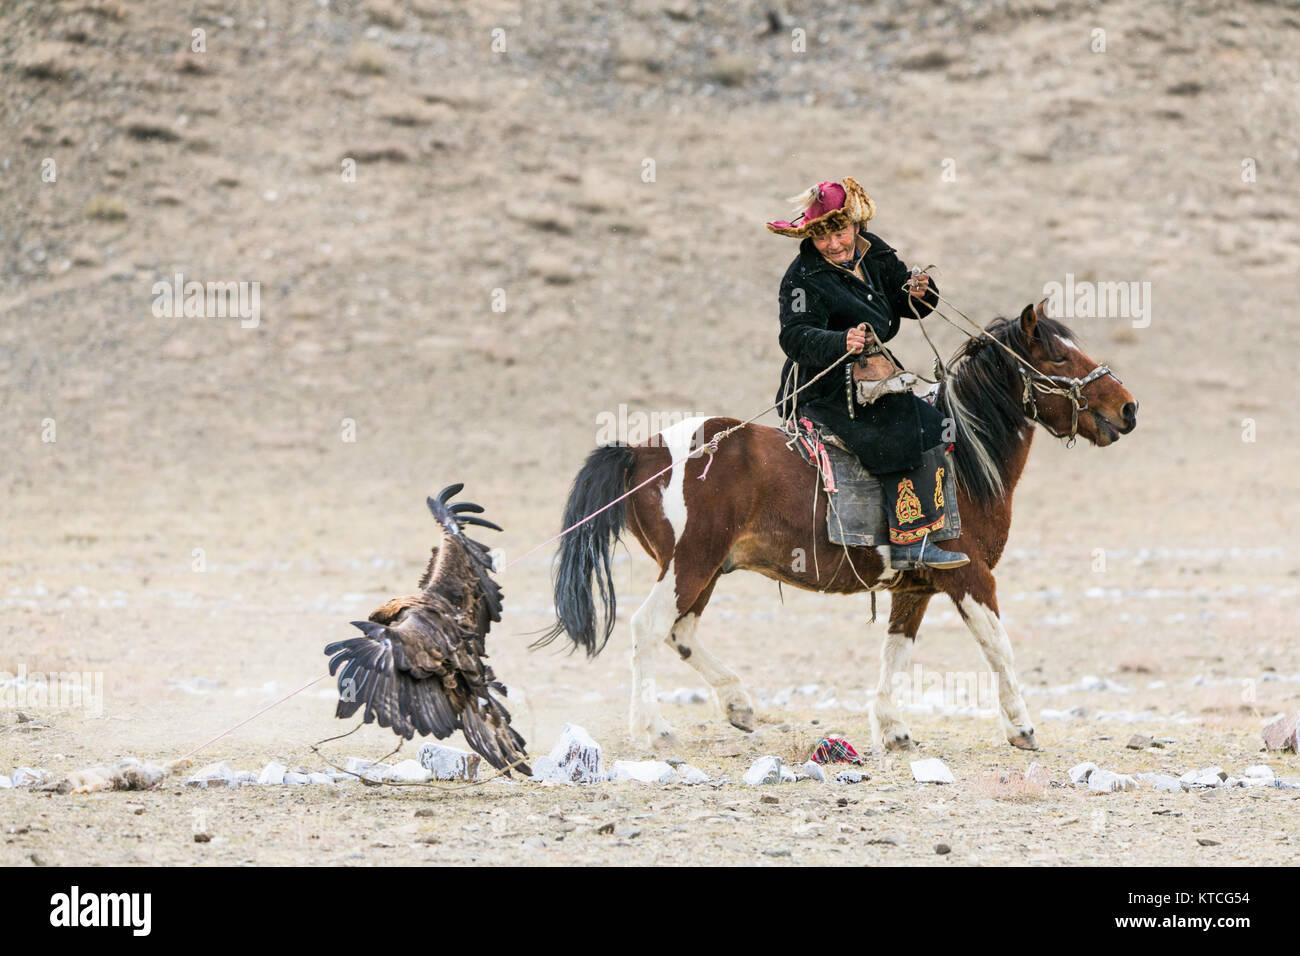 Kazakh eagle hunter on horseback competing at the Golden Eagle Festival in Mongolia - Stock Image